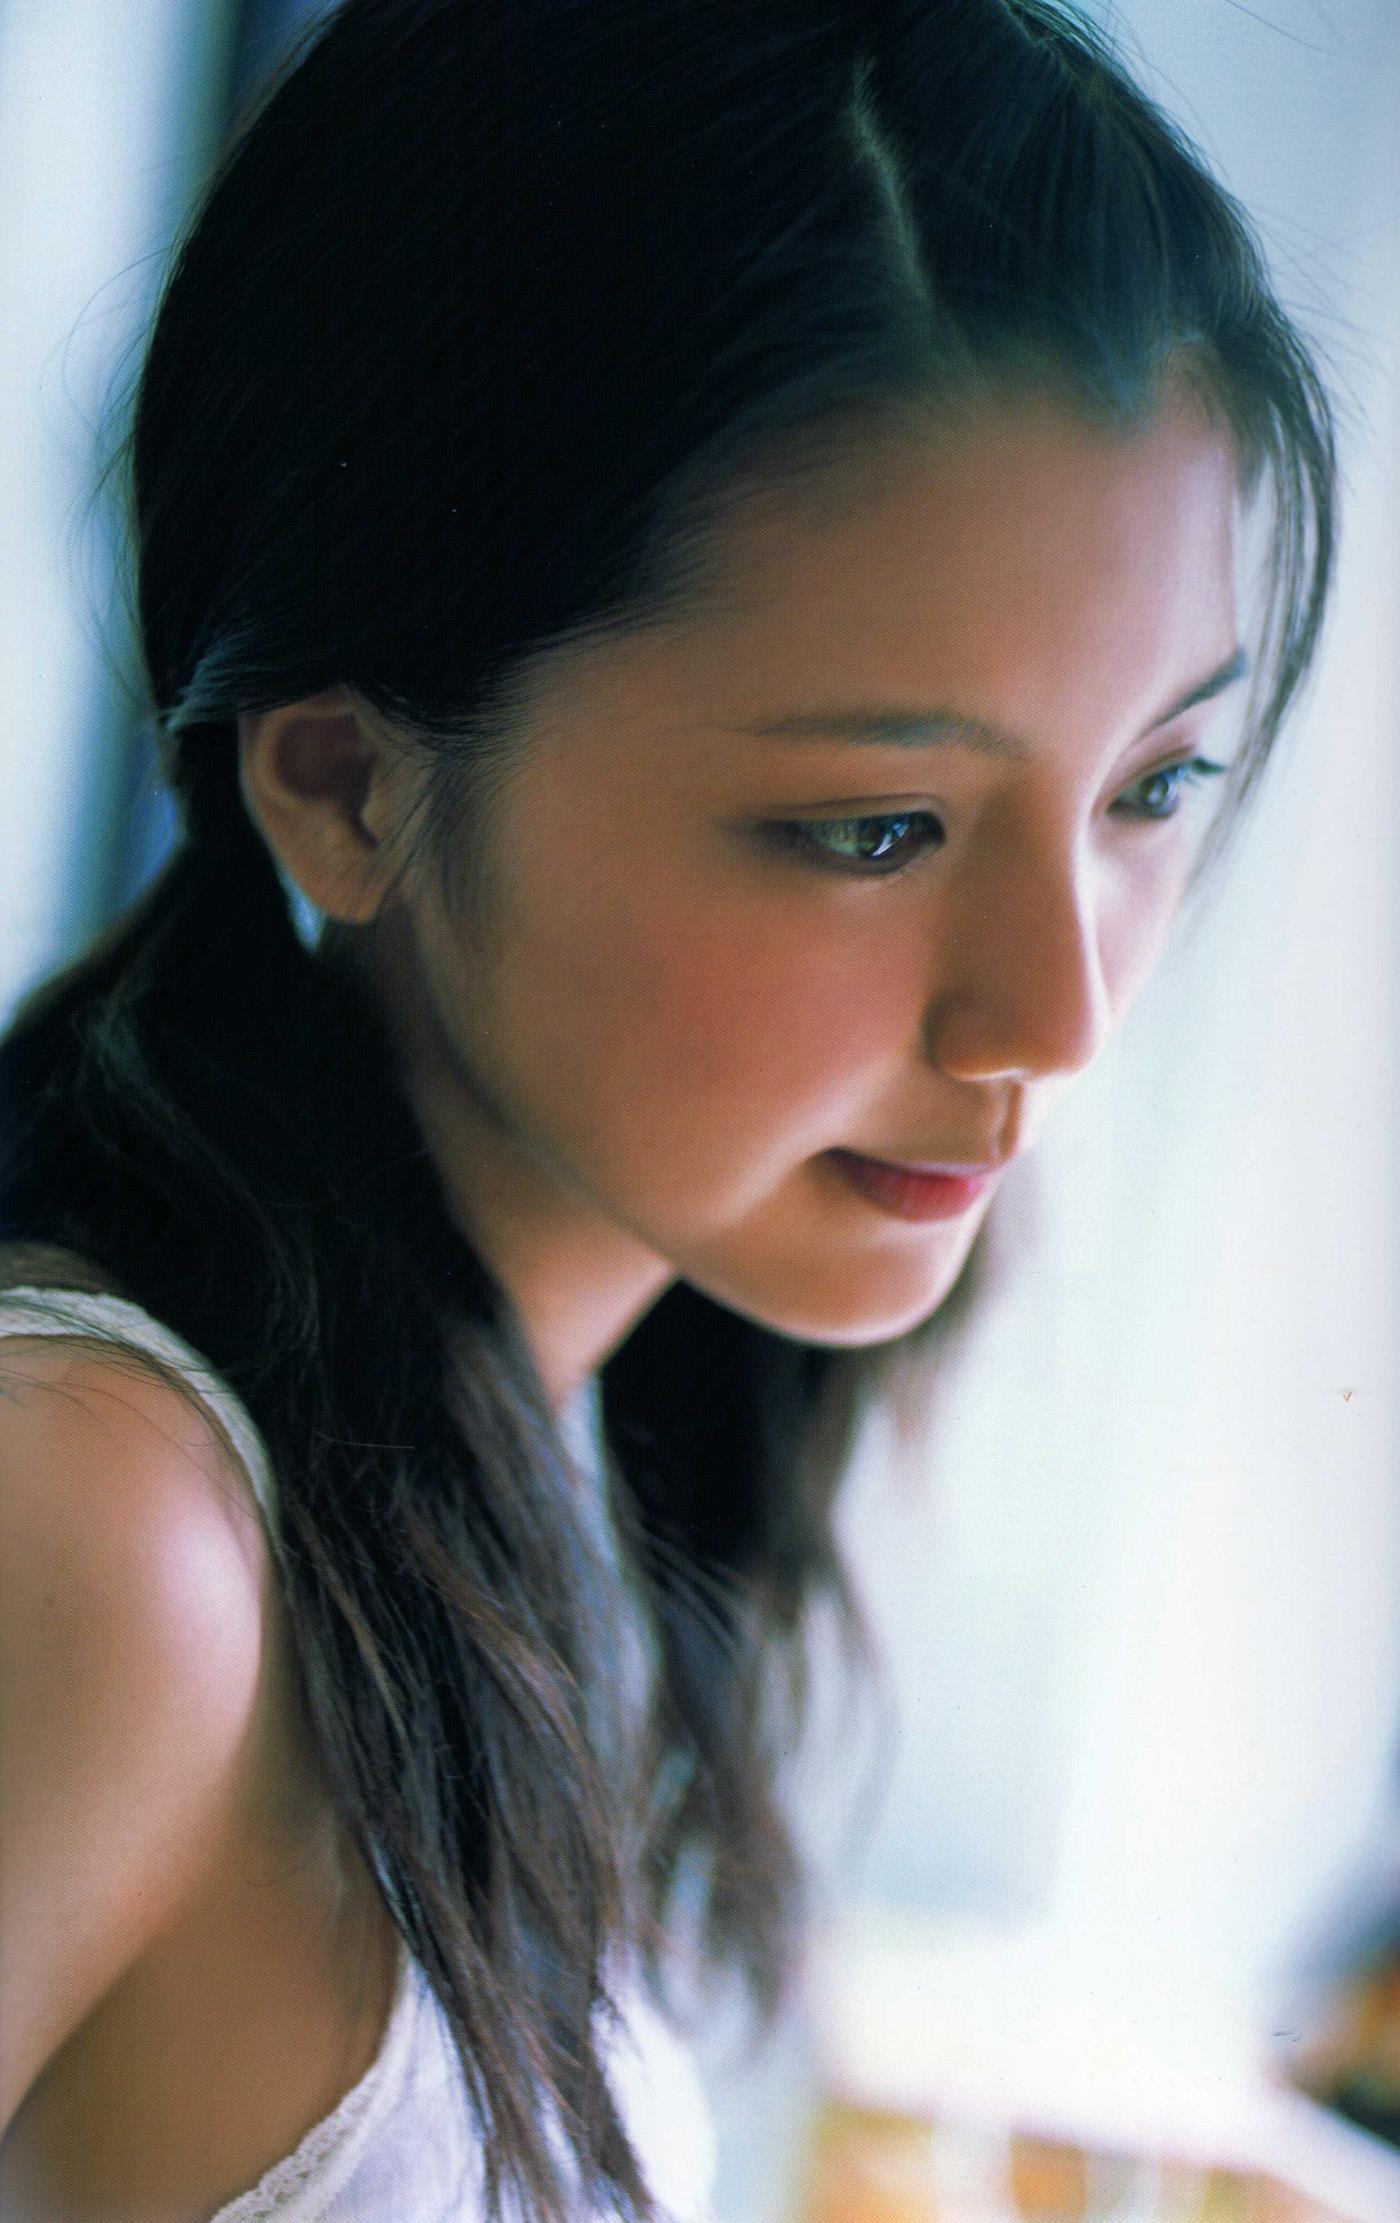 真野恵里菜 エロ画像 106